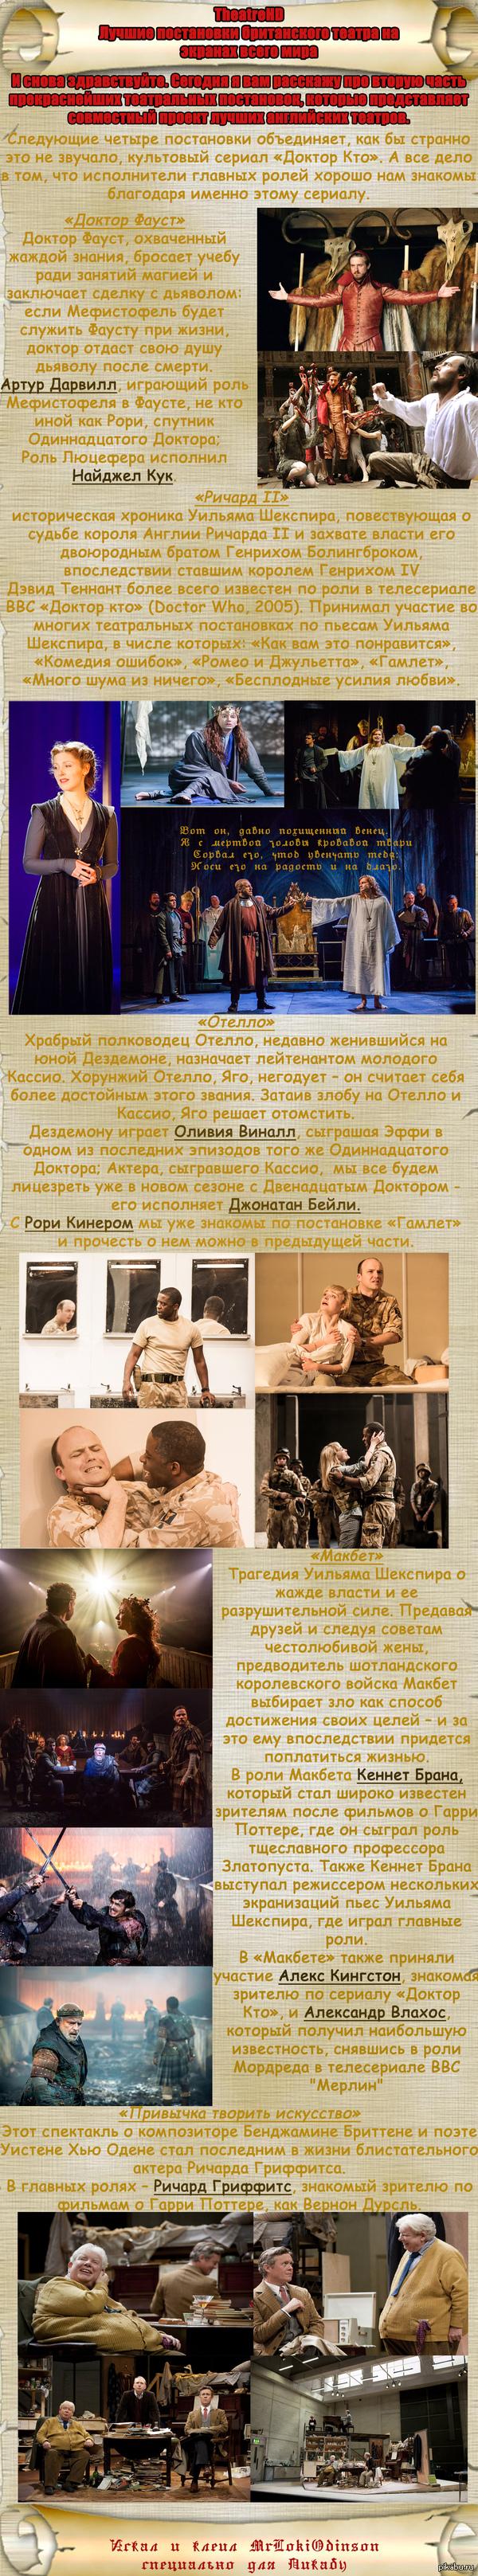 "Шедевры английского театра в кино ЧАСТЬ 2 часть 1 <a href=""http://pikabu.ru/story/shedevryi_angliyskogo_teatra_v_kino_chast_1_2356353"">http://pikabu.ru/story/_2356353</a>"